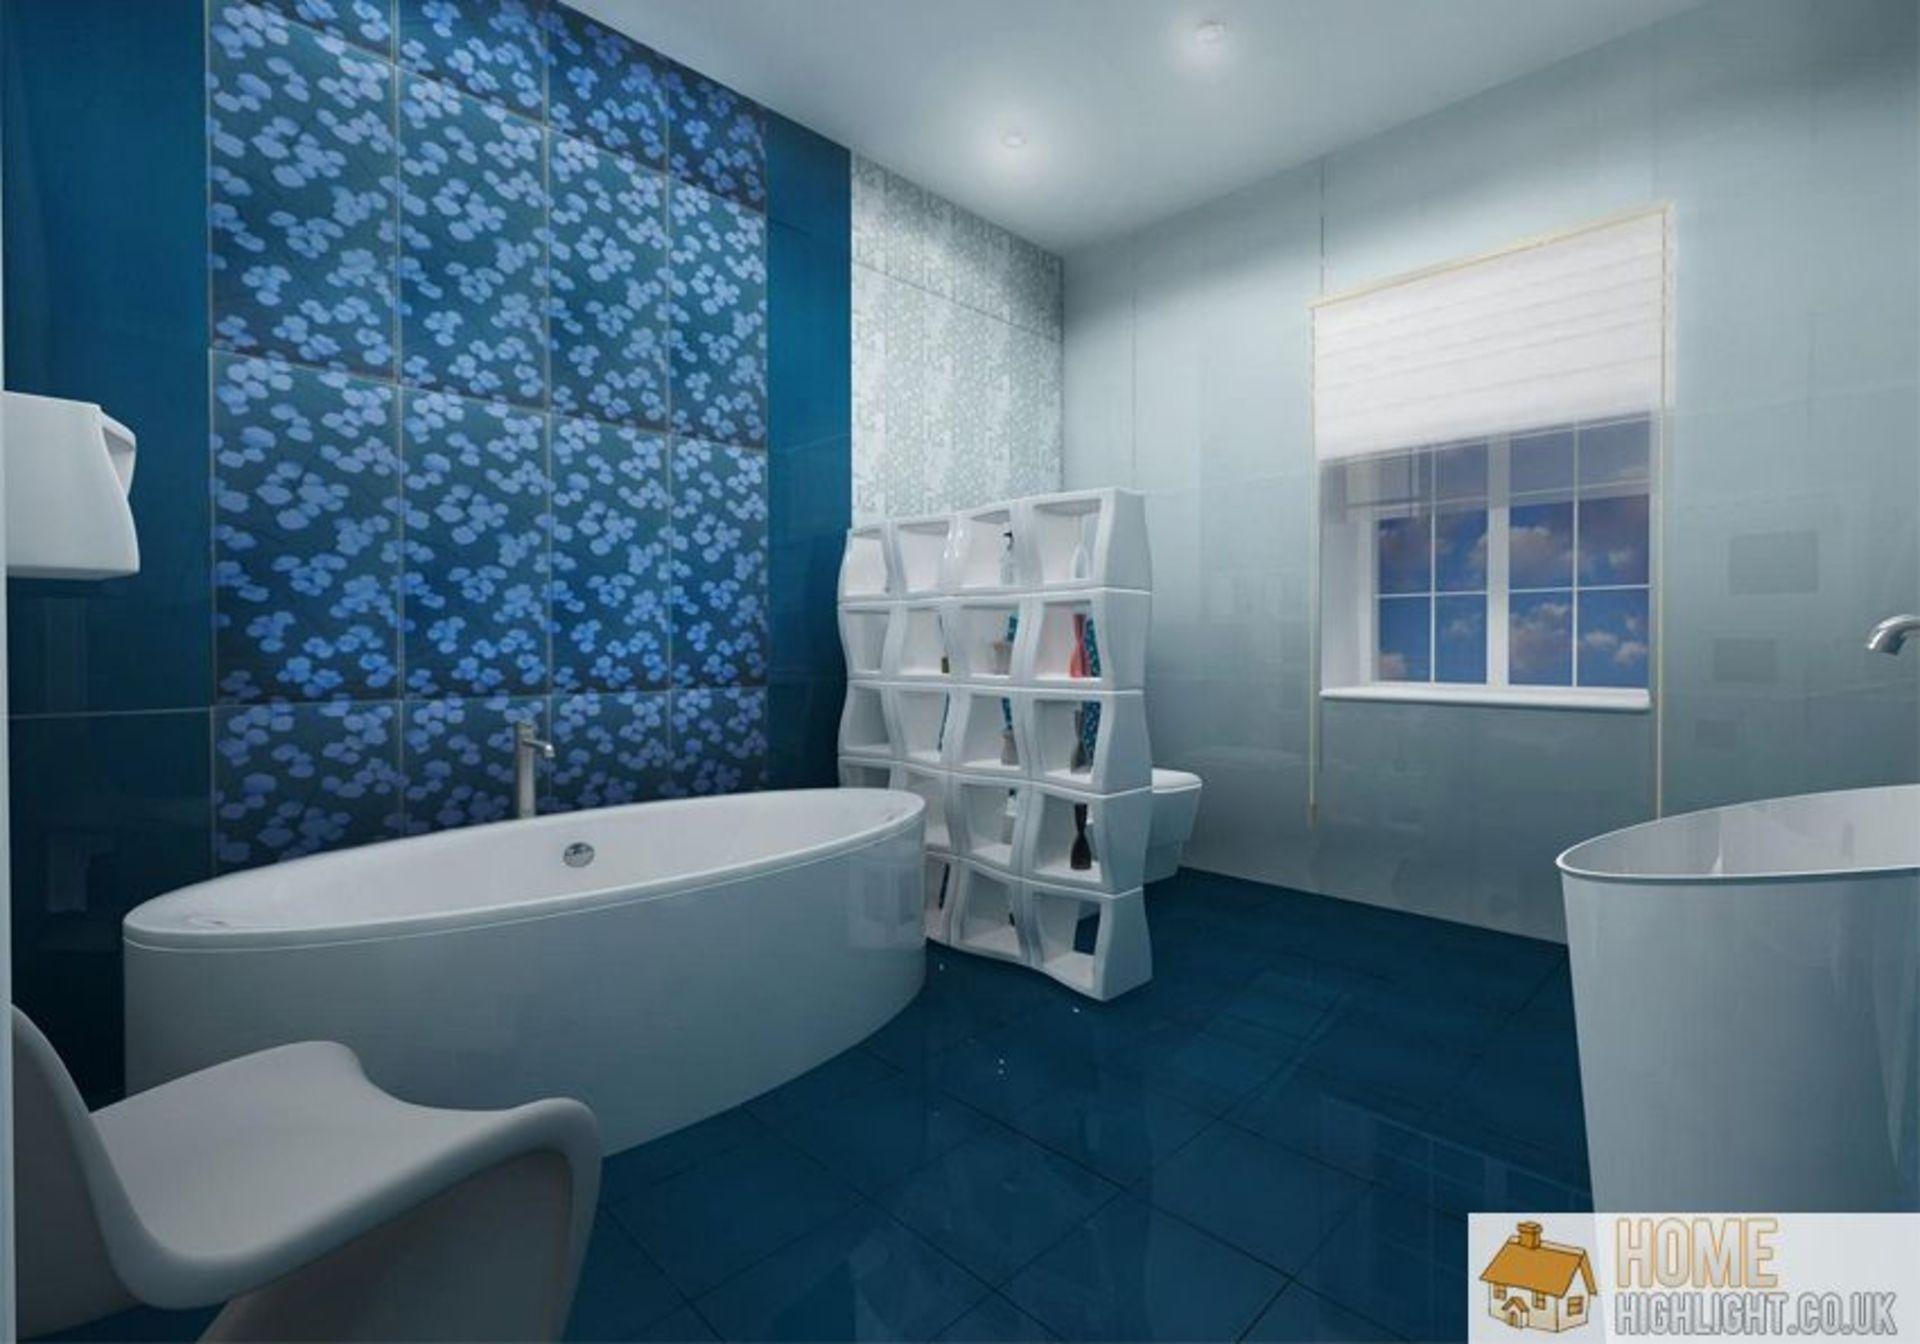 Futuristic Blue Bathroom Design Interior Images Bathroom Ideas Blue And Grey Bathroom Photo Blue Bathroom Wall Tile Design Blue Bathroom Blue Bathrooms Designs